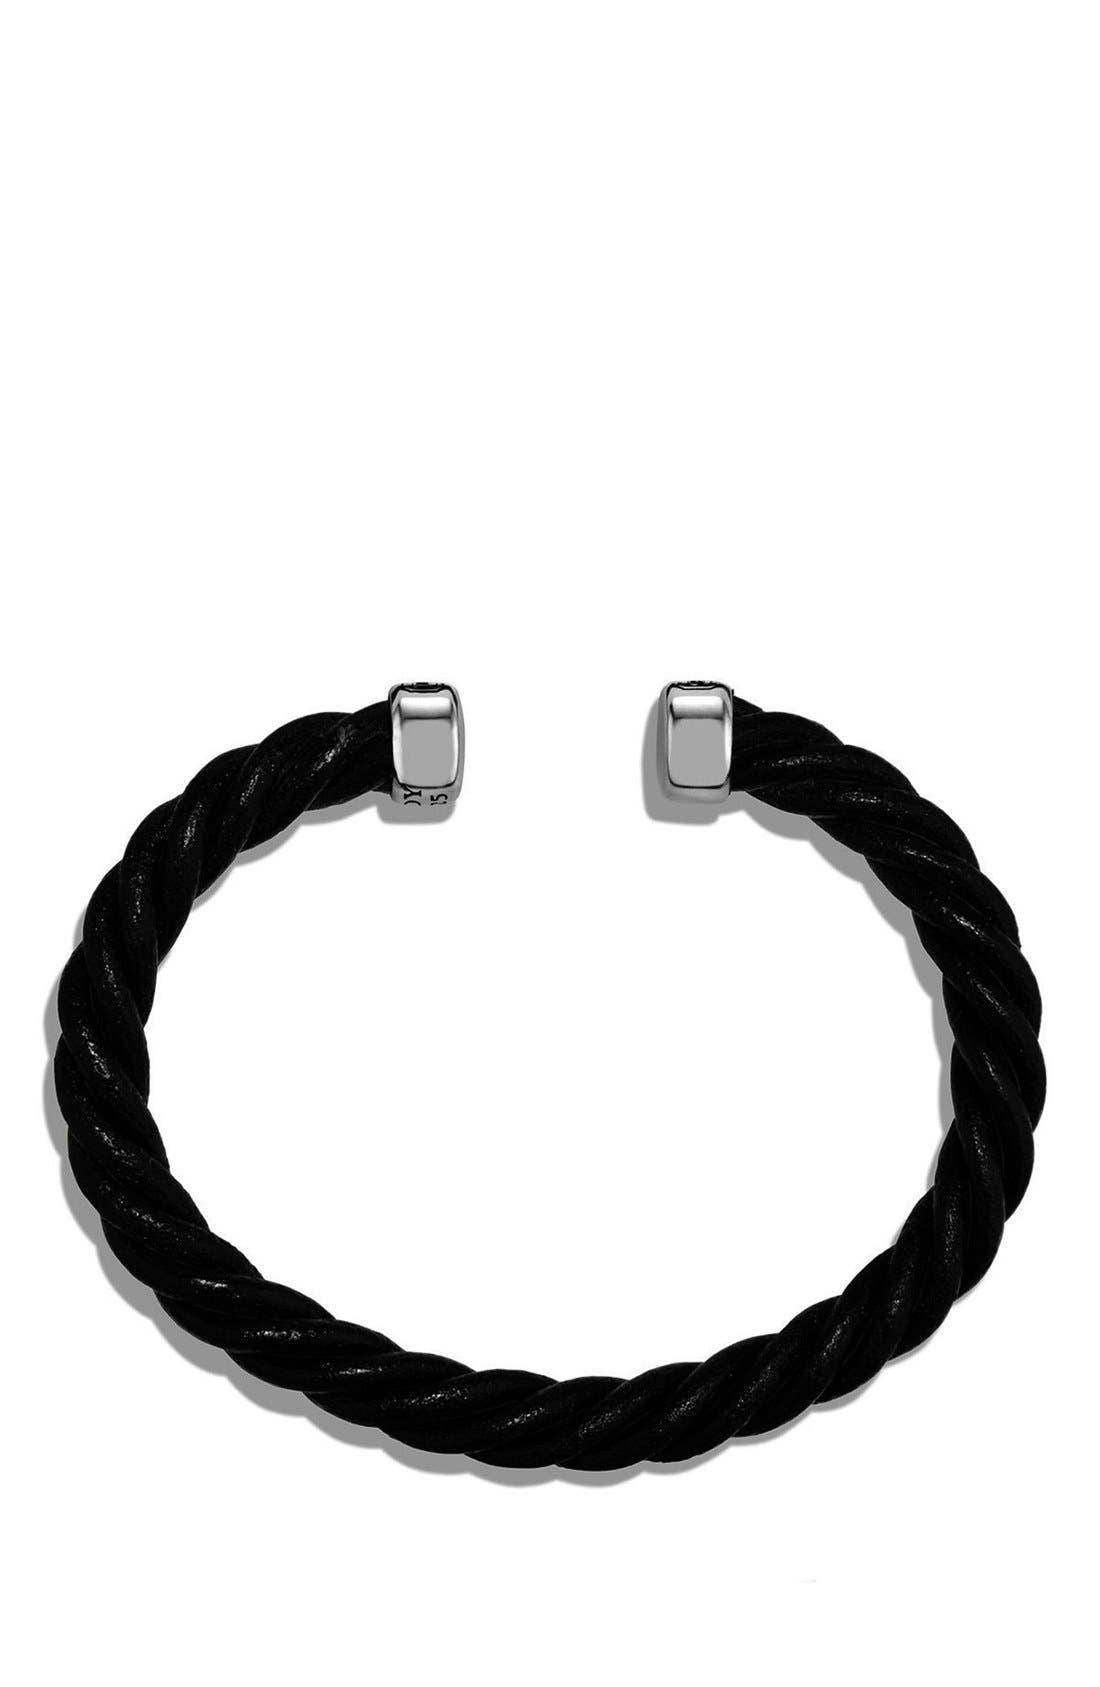 DAVID YURMAN, Leather Cuff Bracelet, Alternate thumbnail 3, color, SILVER/ BLACK LEATHER